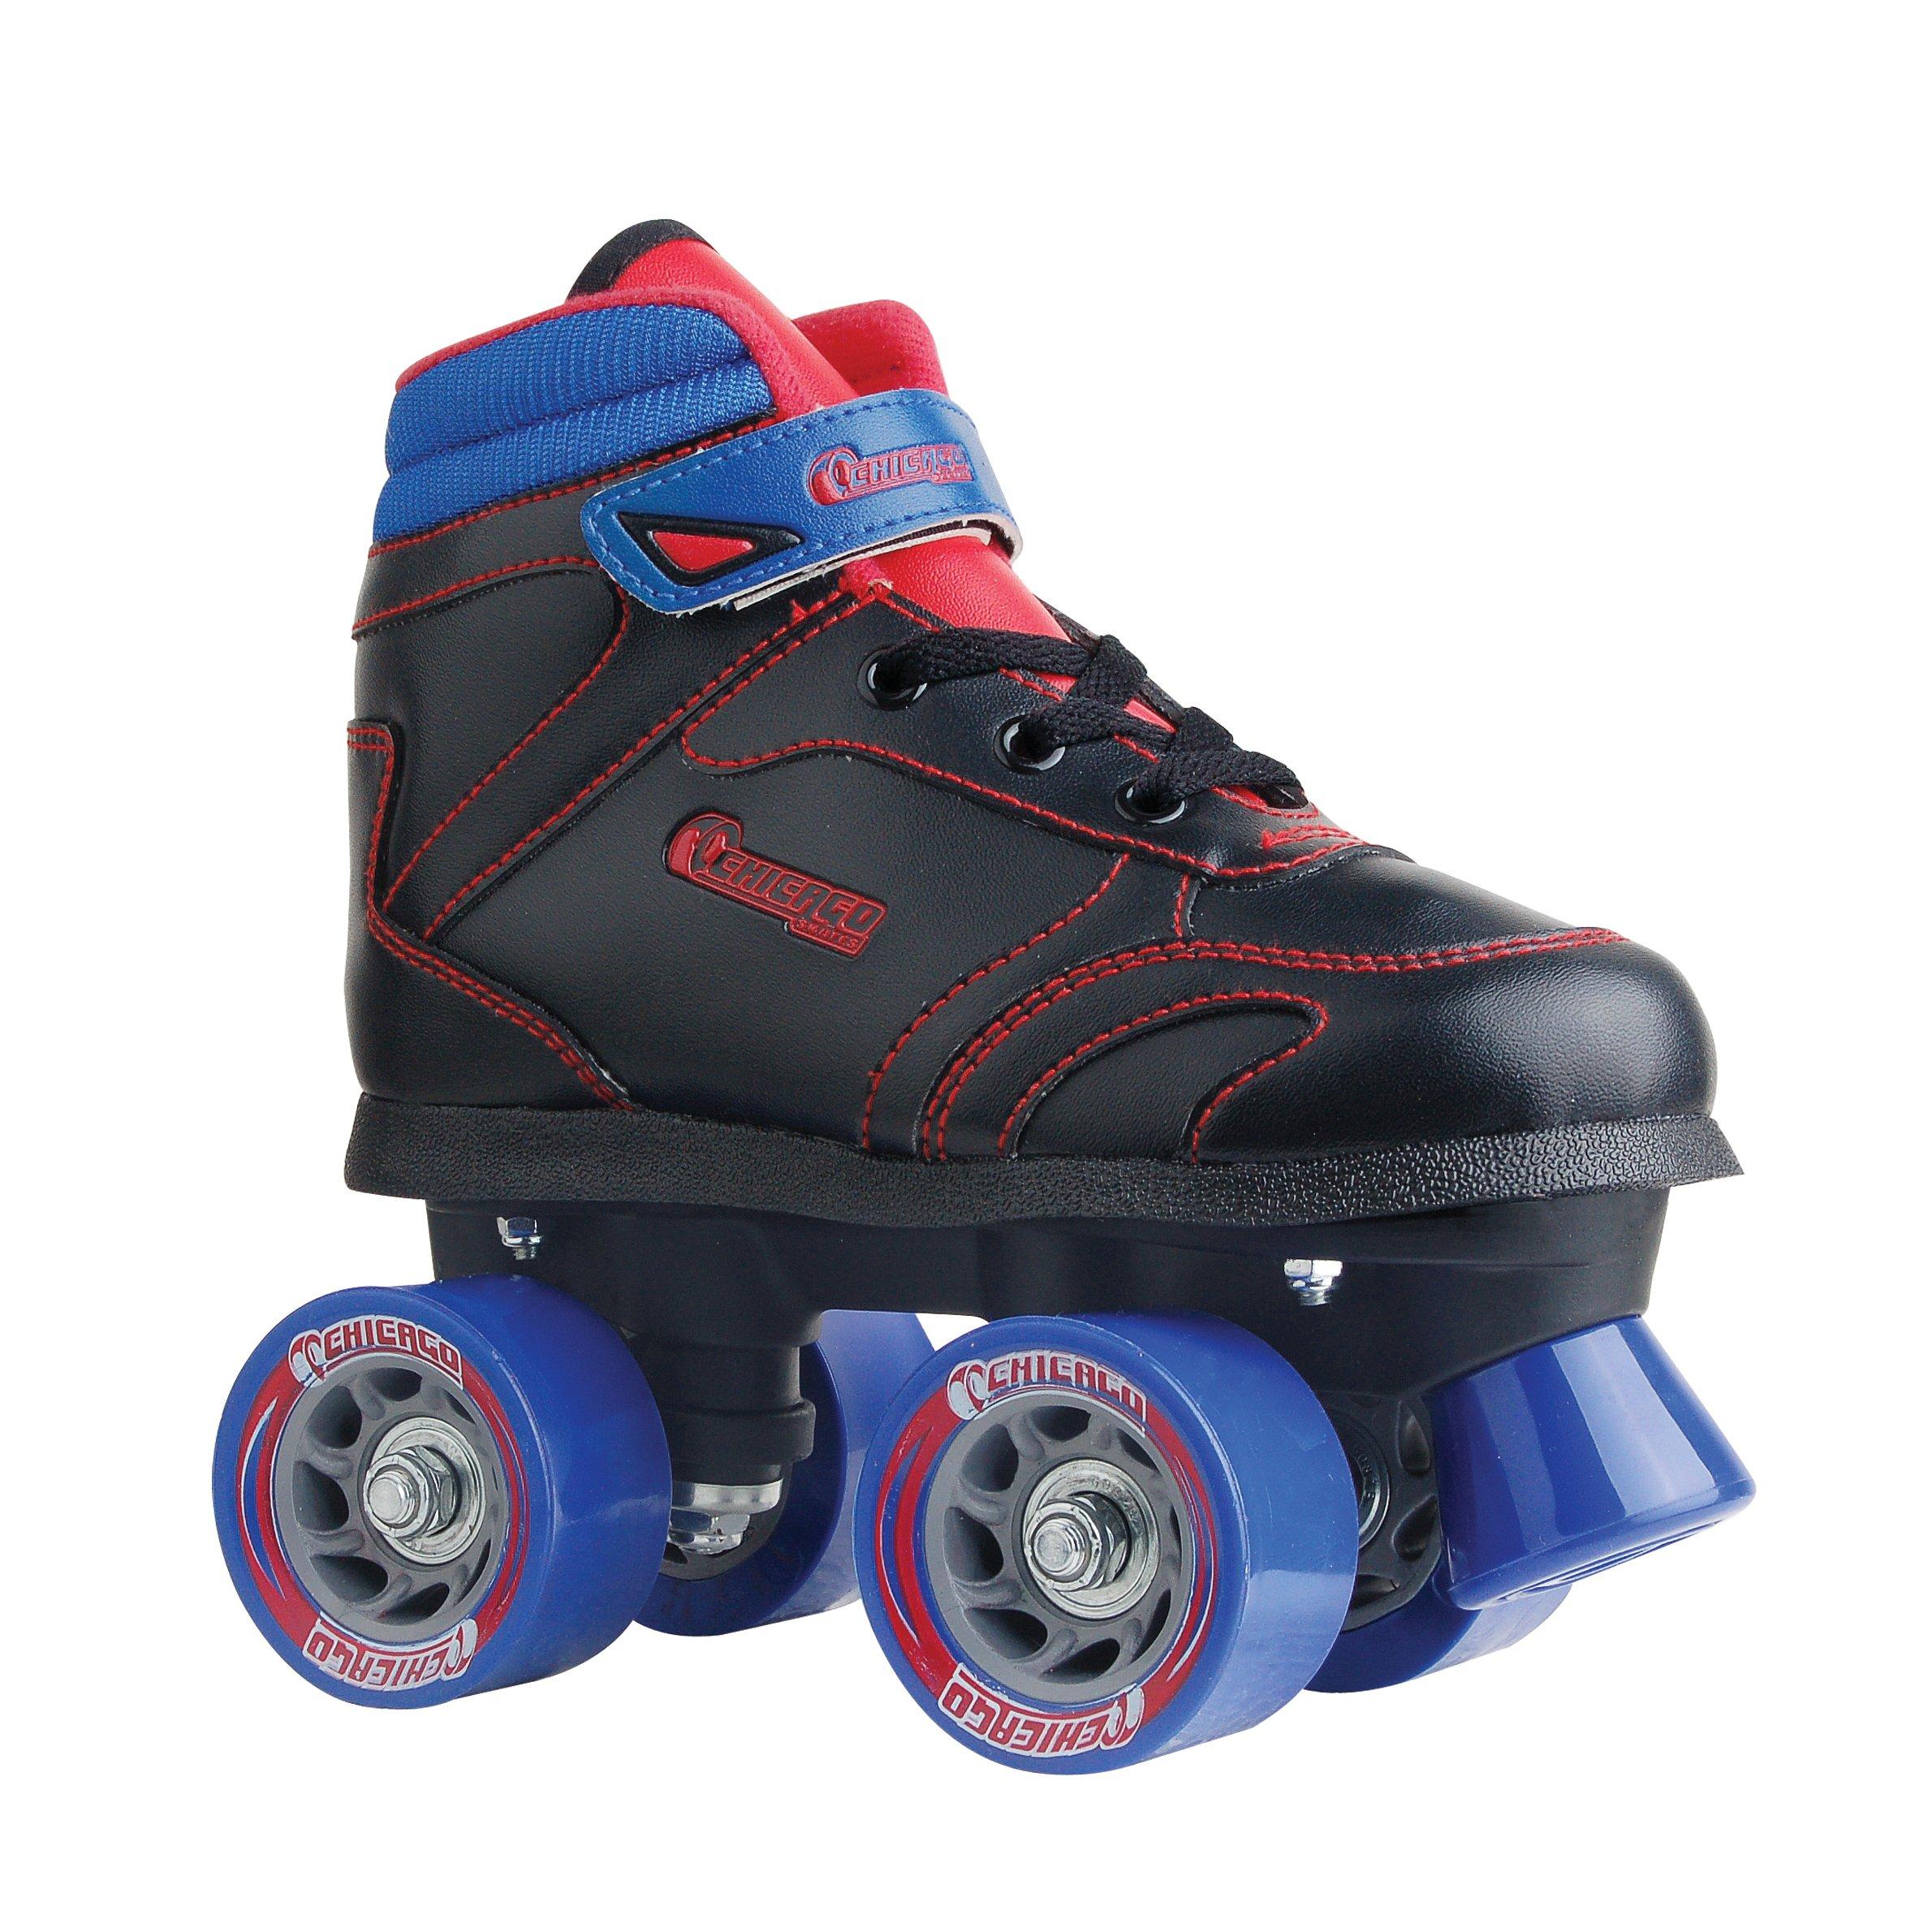 Chicago Boys Sidewalk Roller Skate- Black Size 2